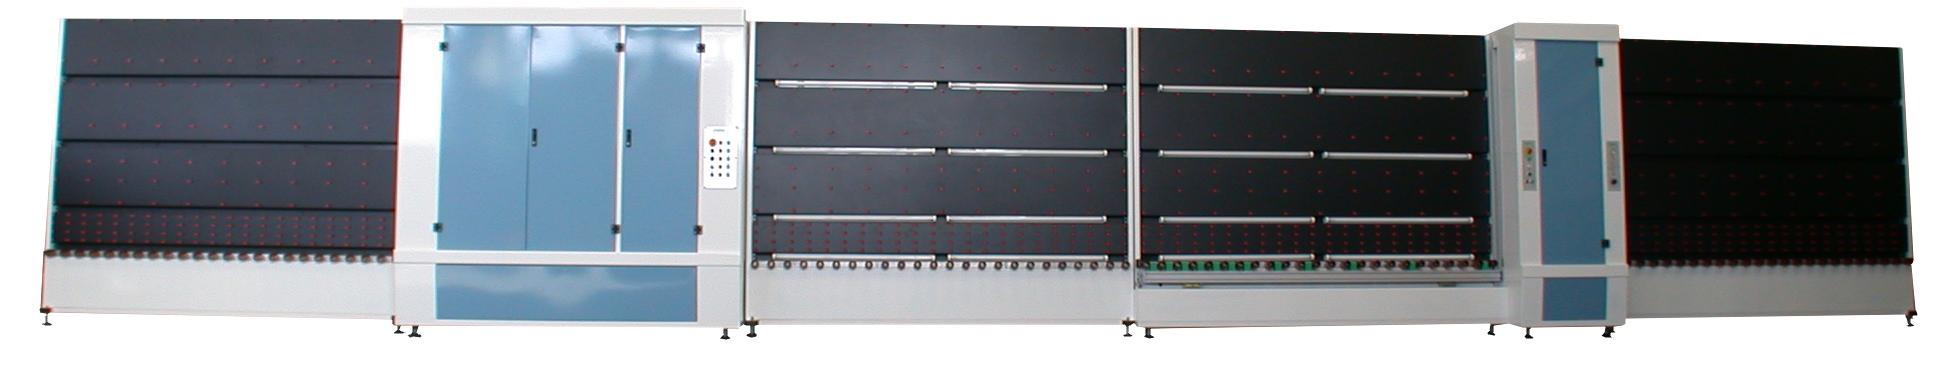 M1601-2001